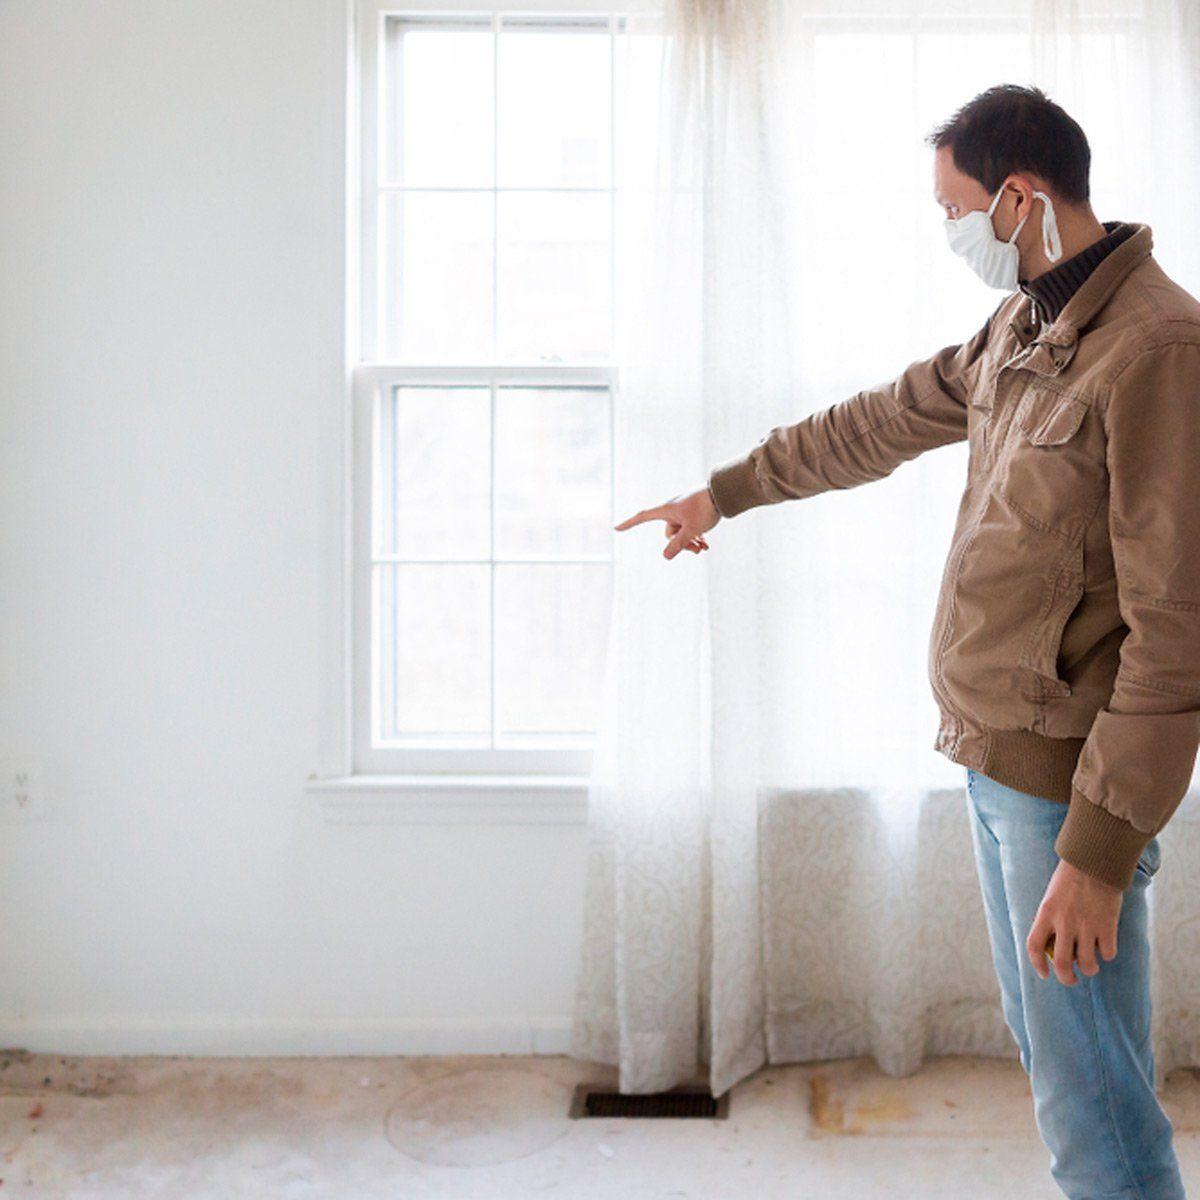 Man pointing at window